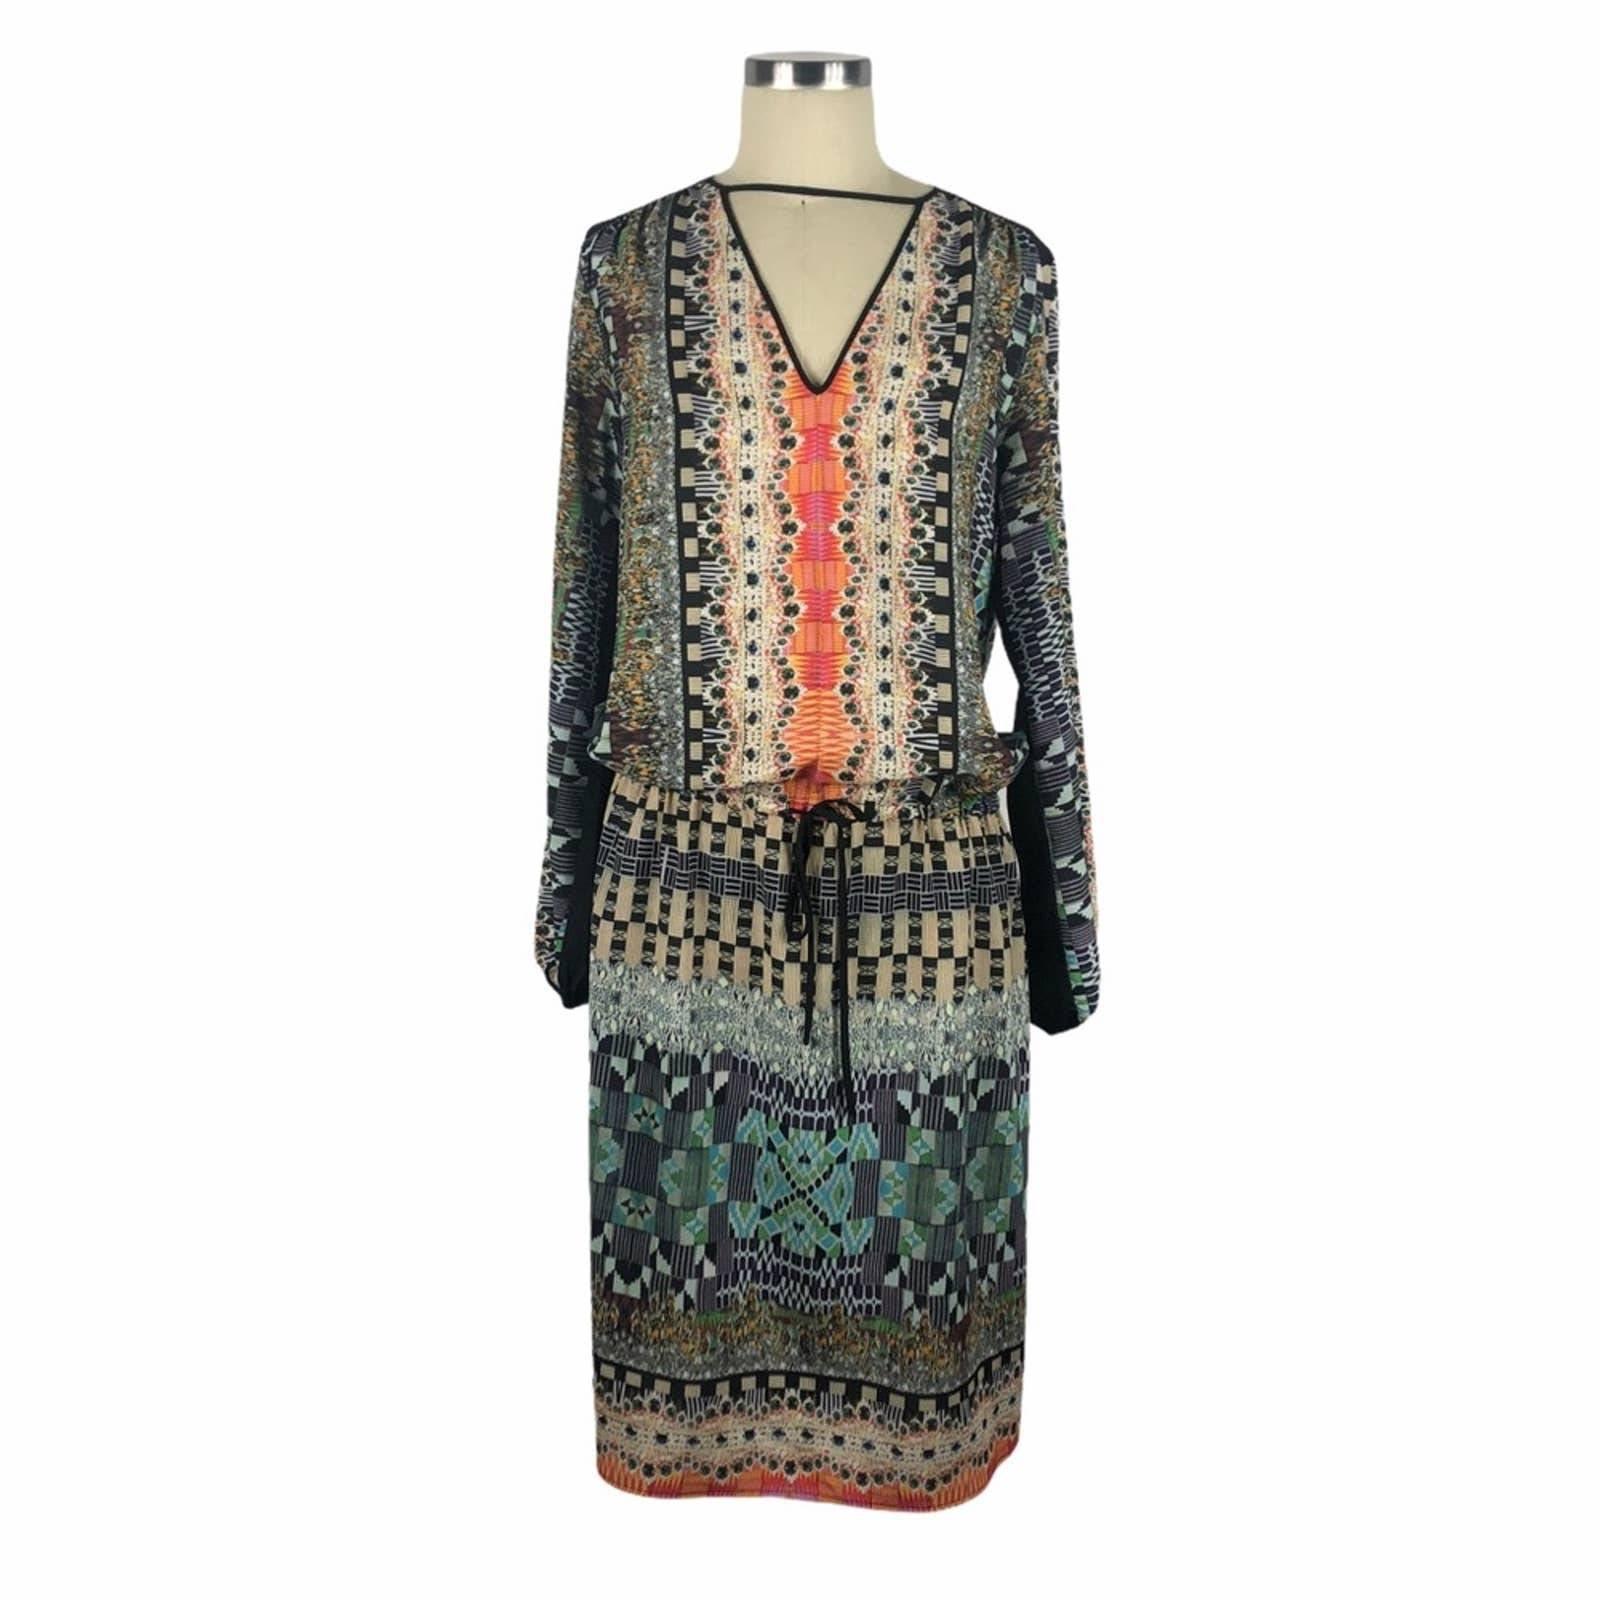 CLOVER CANYON Colorful Drop Waist Dress